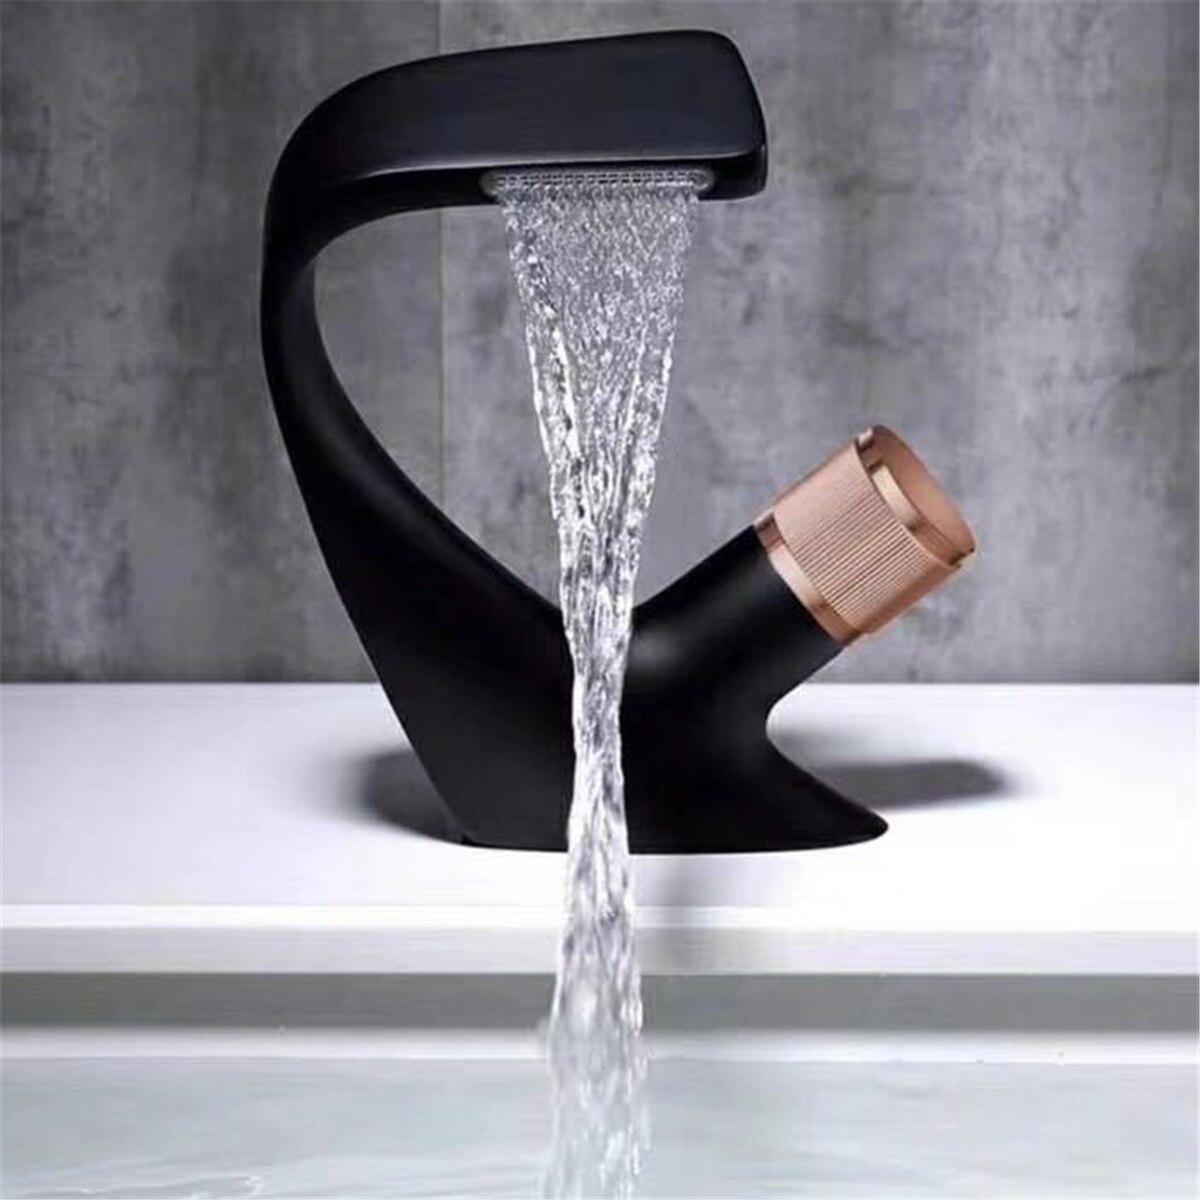 H17e6352cc0414d24bfea9bdb6890347cF Black Faucet Bathroom Sink Faucets Hot Cold Water Mixer Crane Deck Mounted Single Hole Bath Tap Chrome Finished